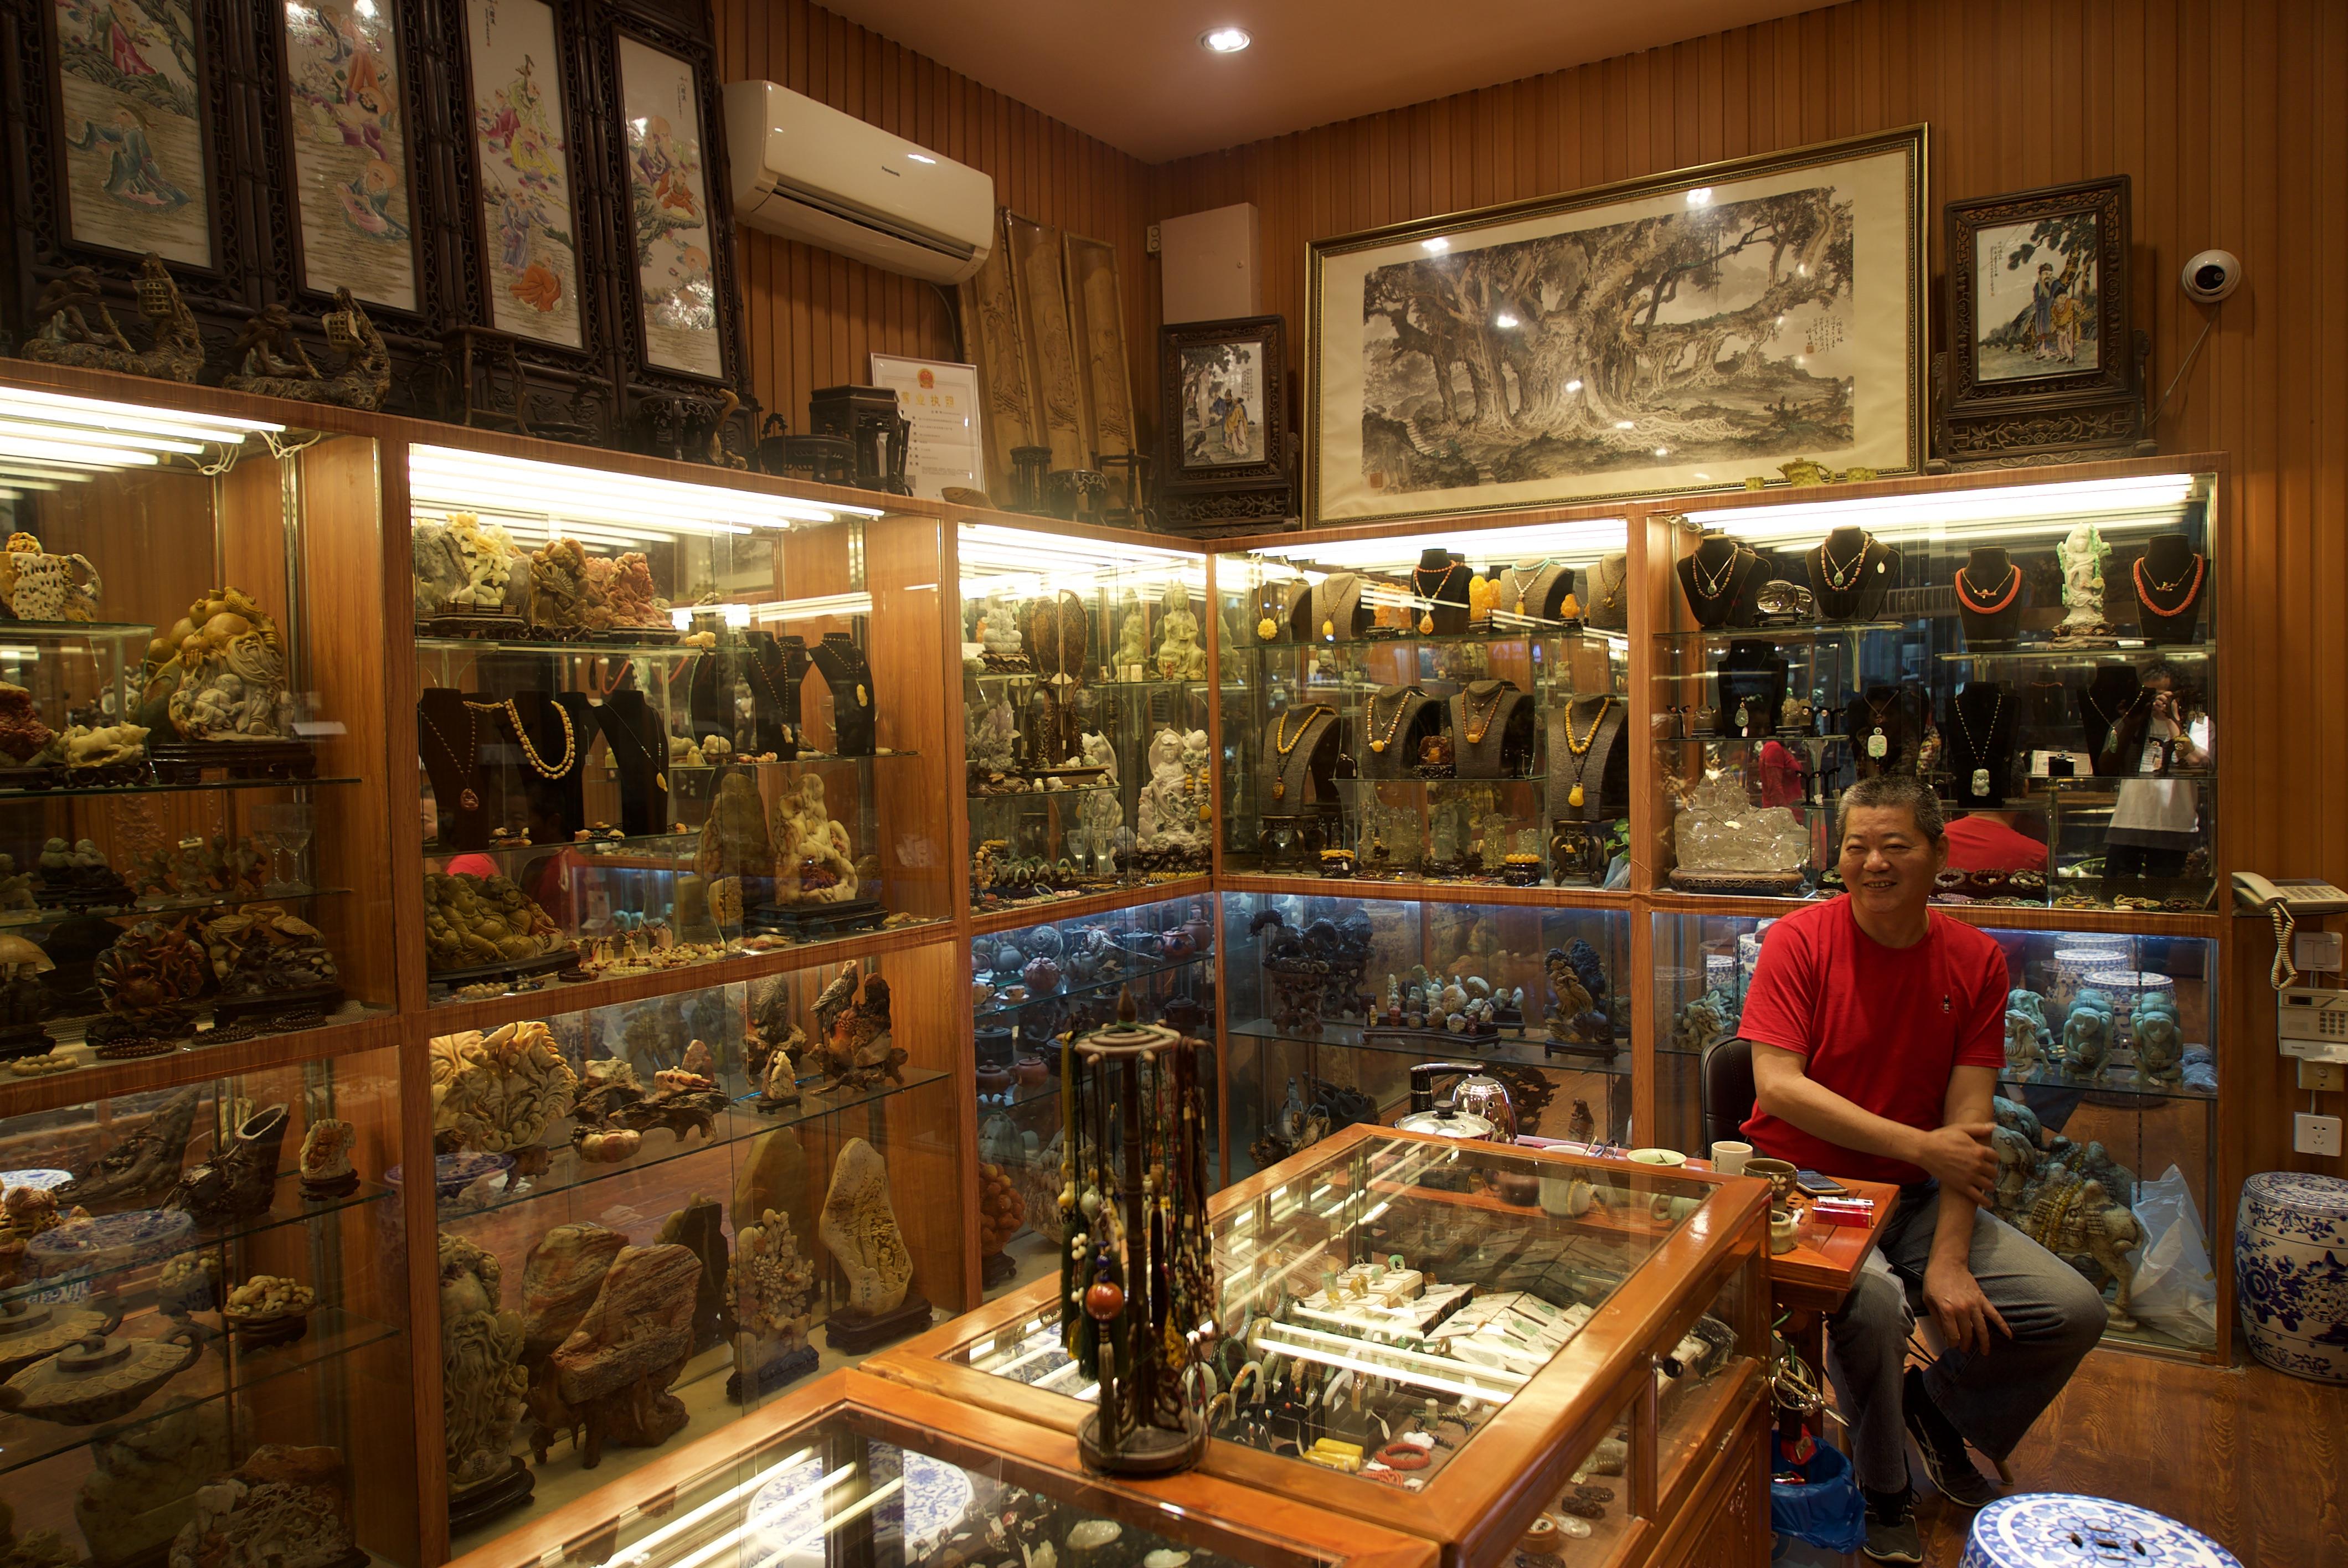 Qing Ya Jade & Amber store (Qing Ya 清雅)